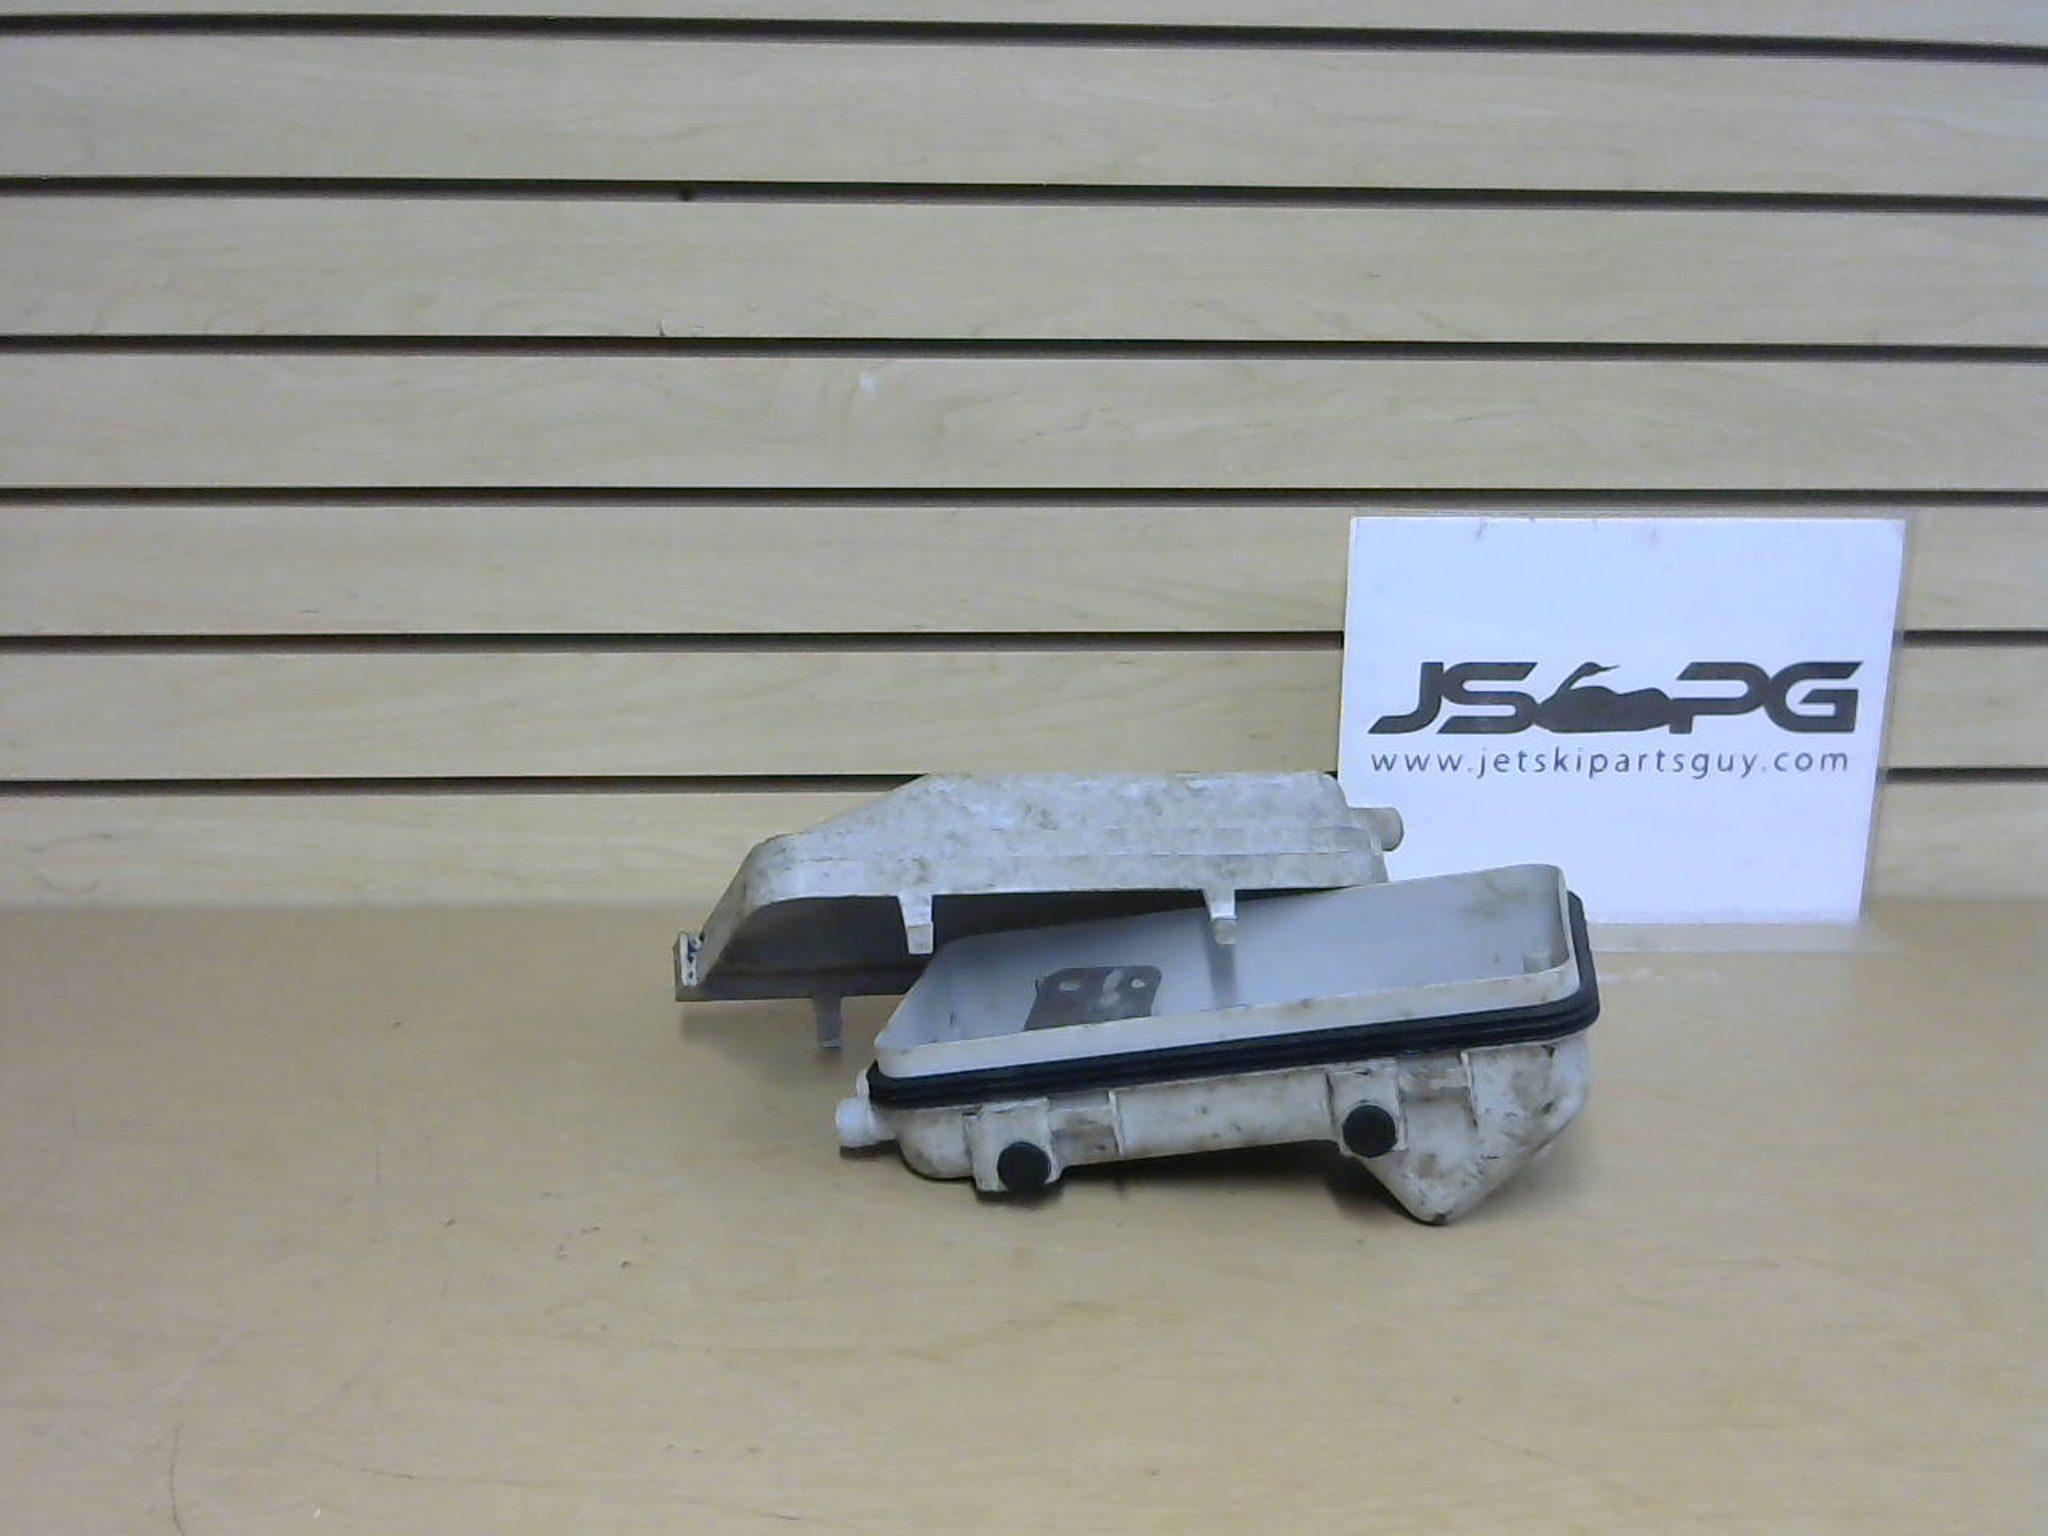 1993 Seadoo SPI Electrical Case Top and Bottom 278000177 278000325 - Used  Jetski Parts - jetskipartsguy com